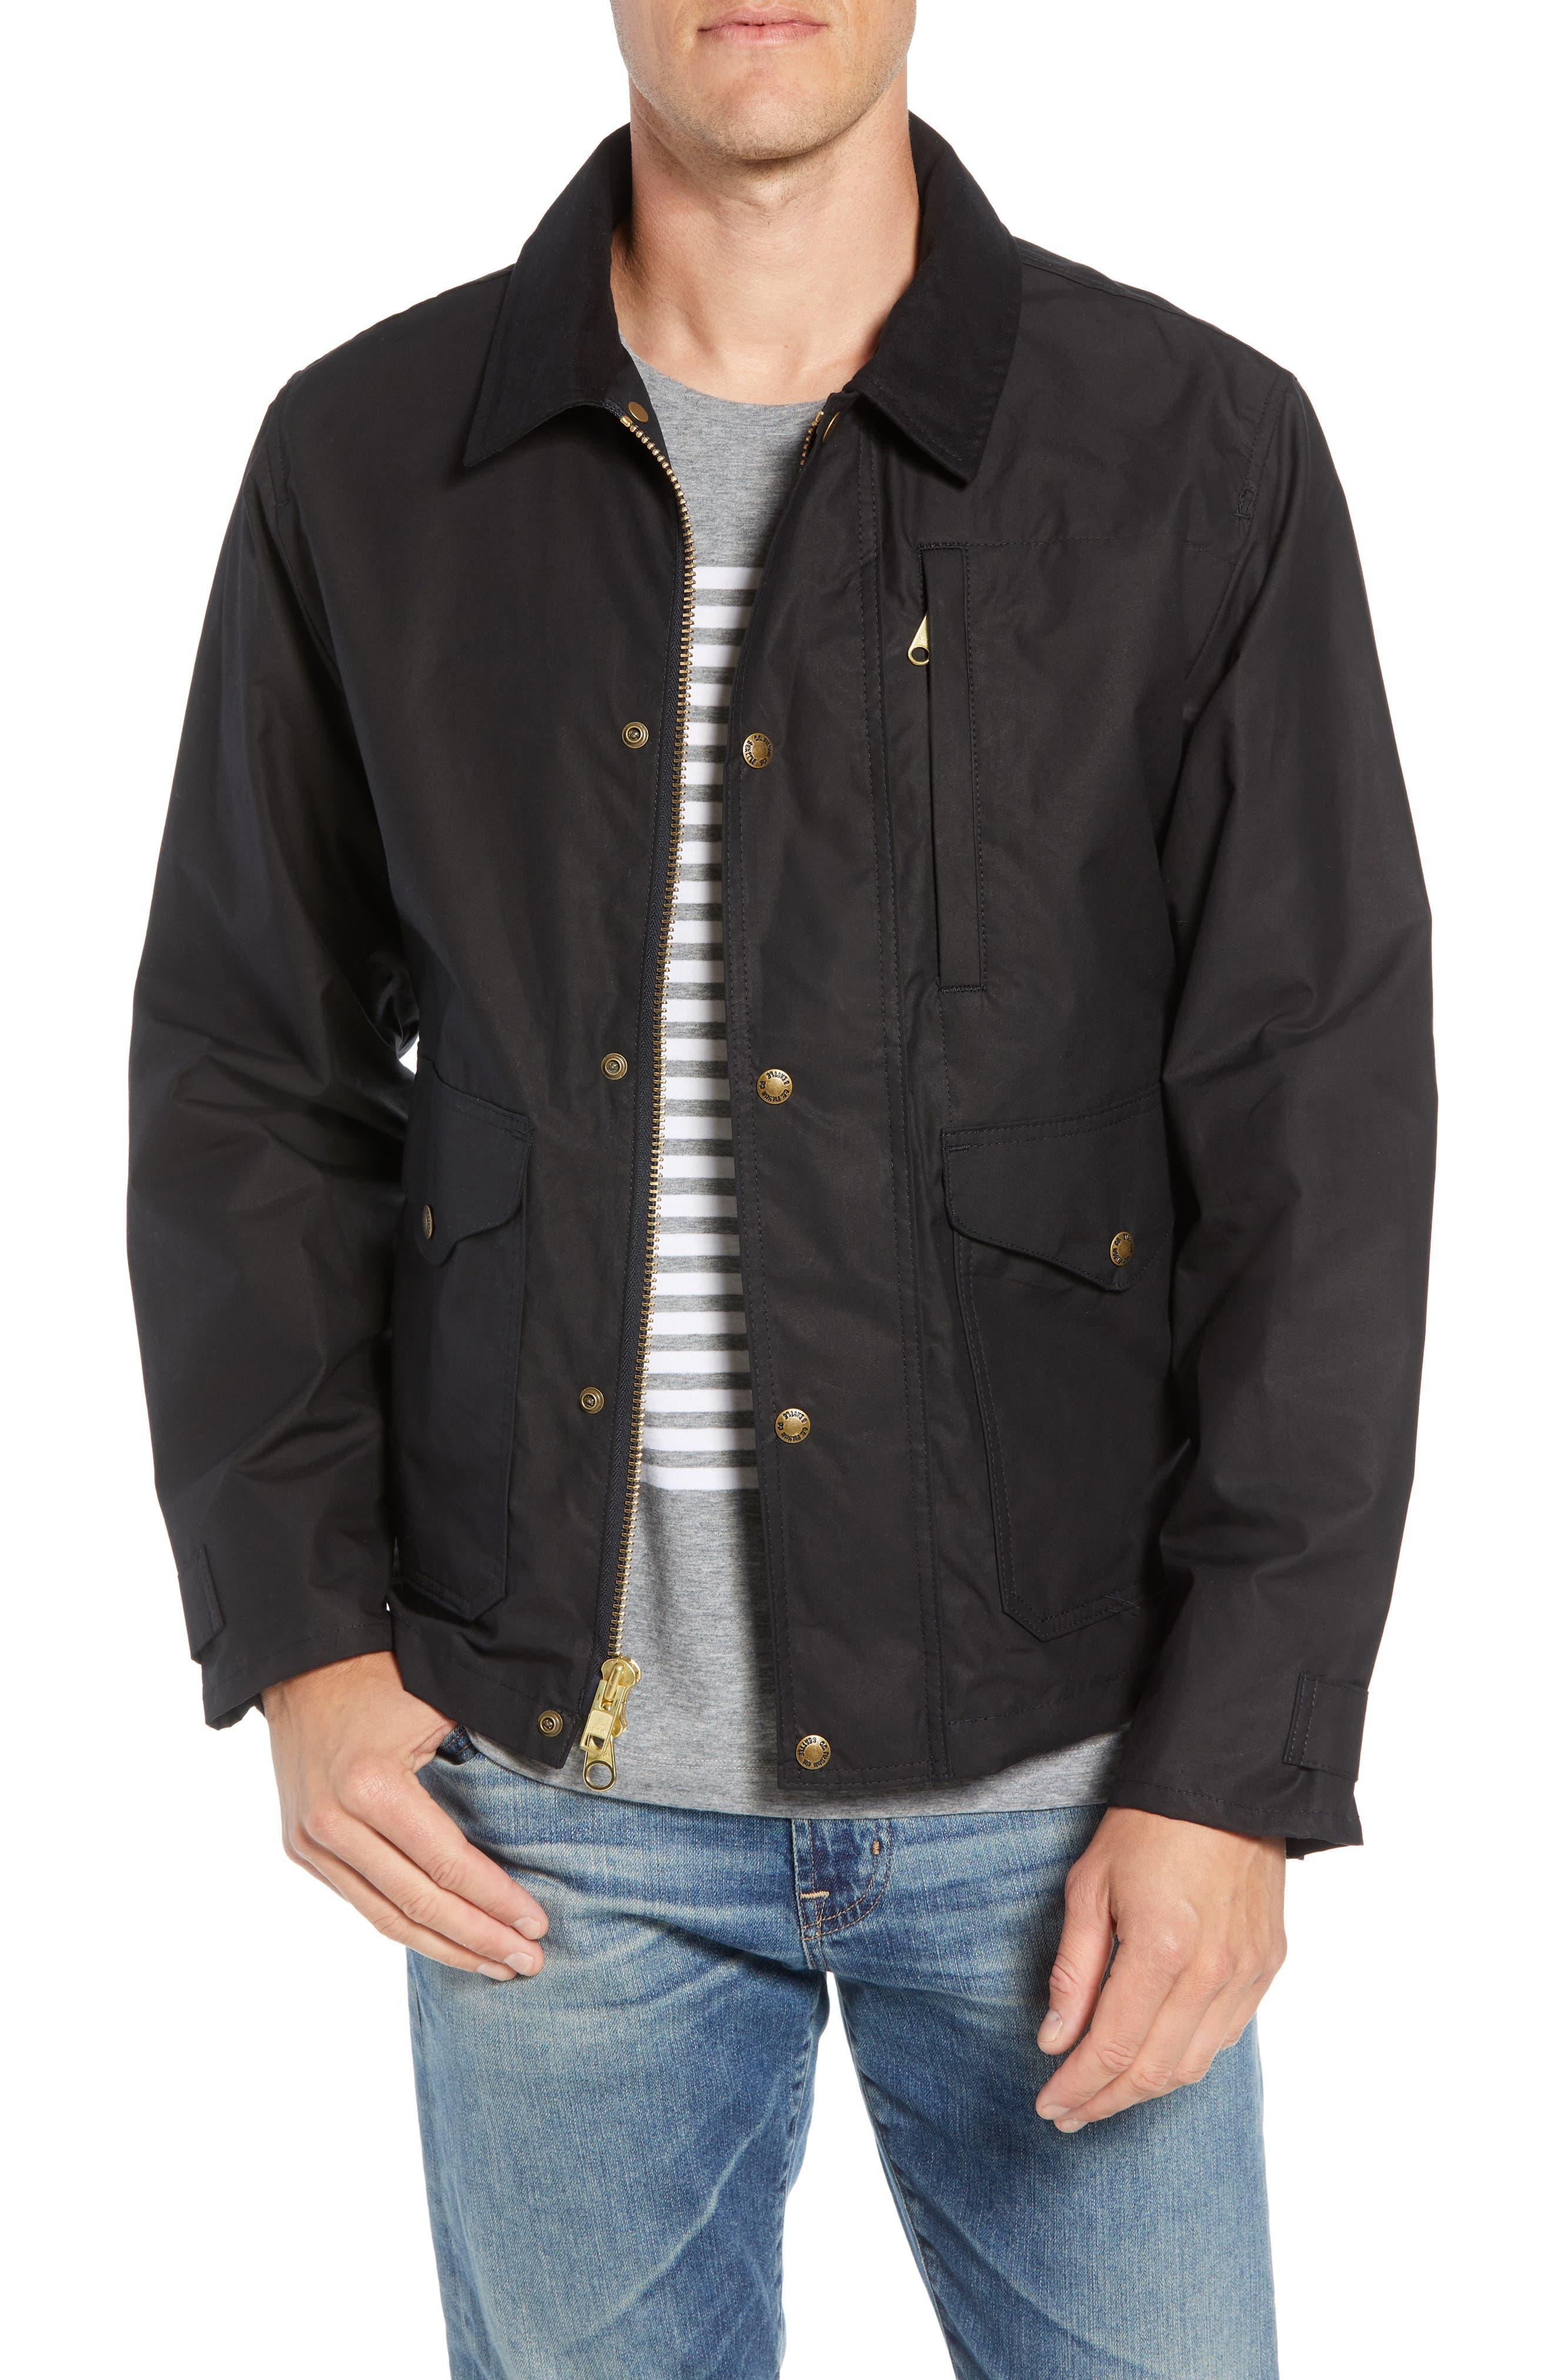 Short Mile Marker Waxed Cotton Jacket,                             Main thumbnail 1, color,                             BLACK